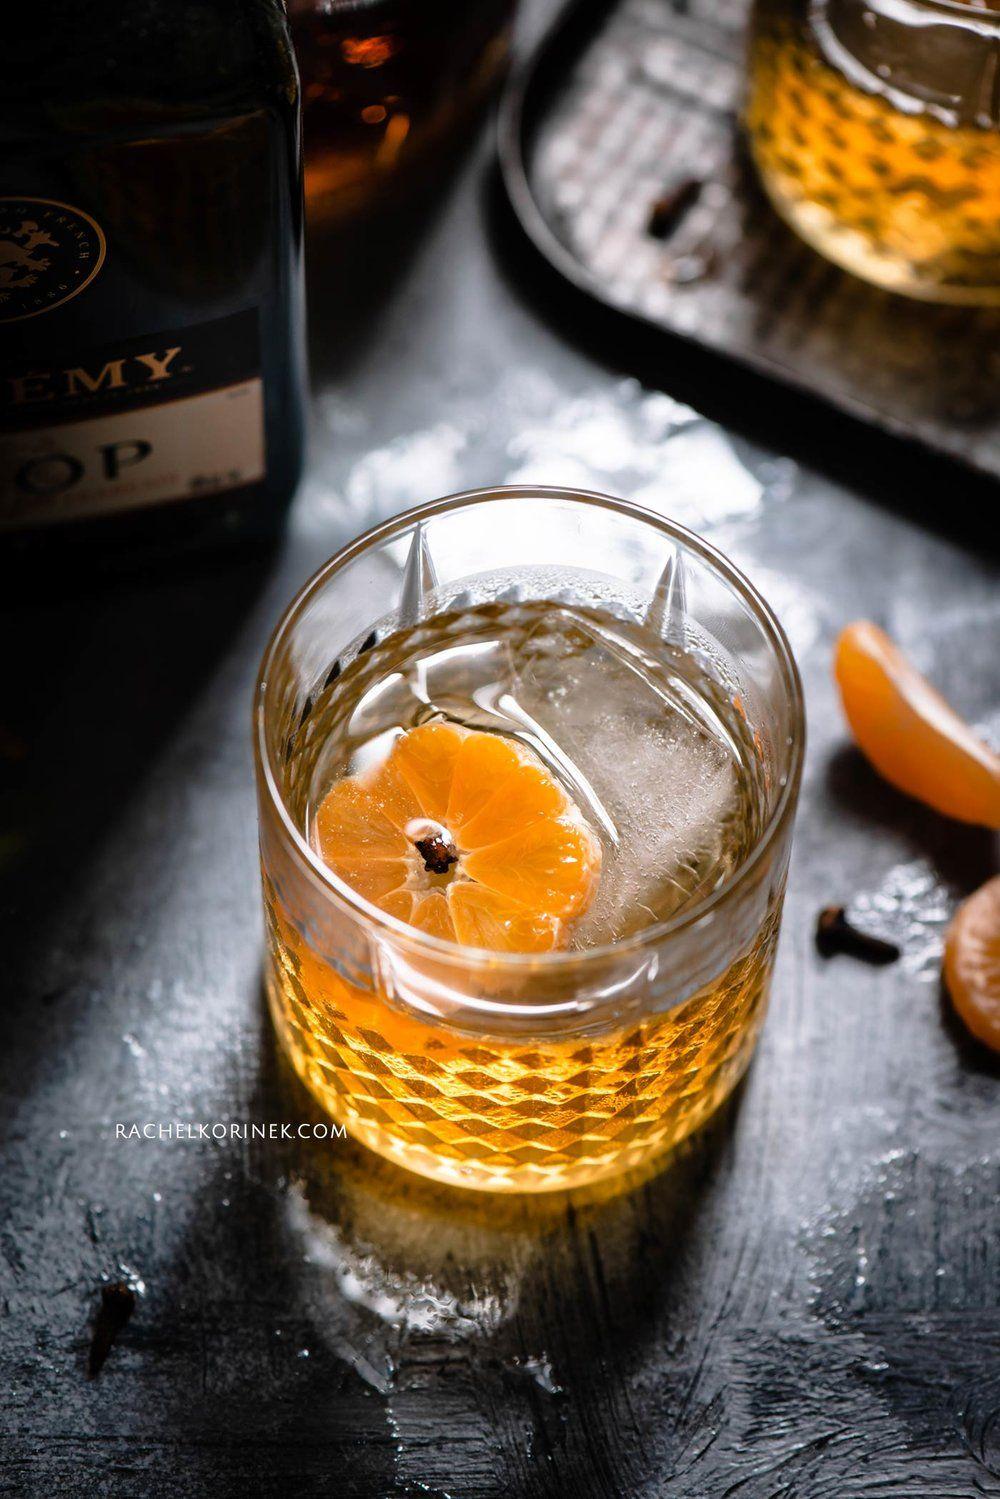 Rachel Korinek PORTFOLIO in 2020 Whiskey sour, Cocktail